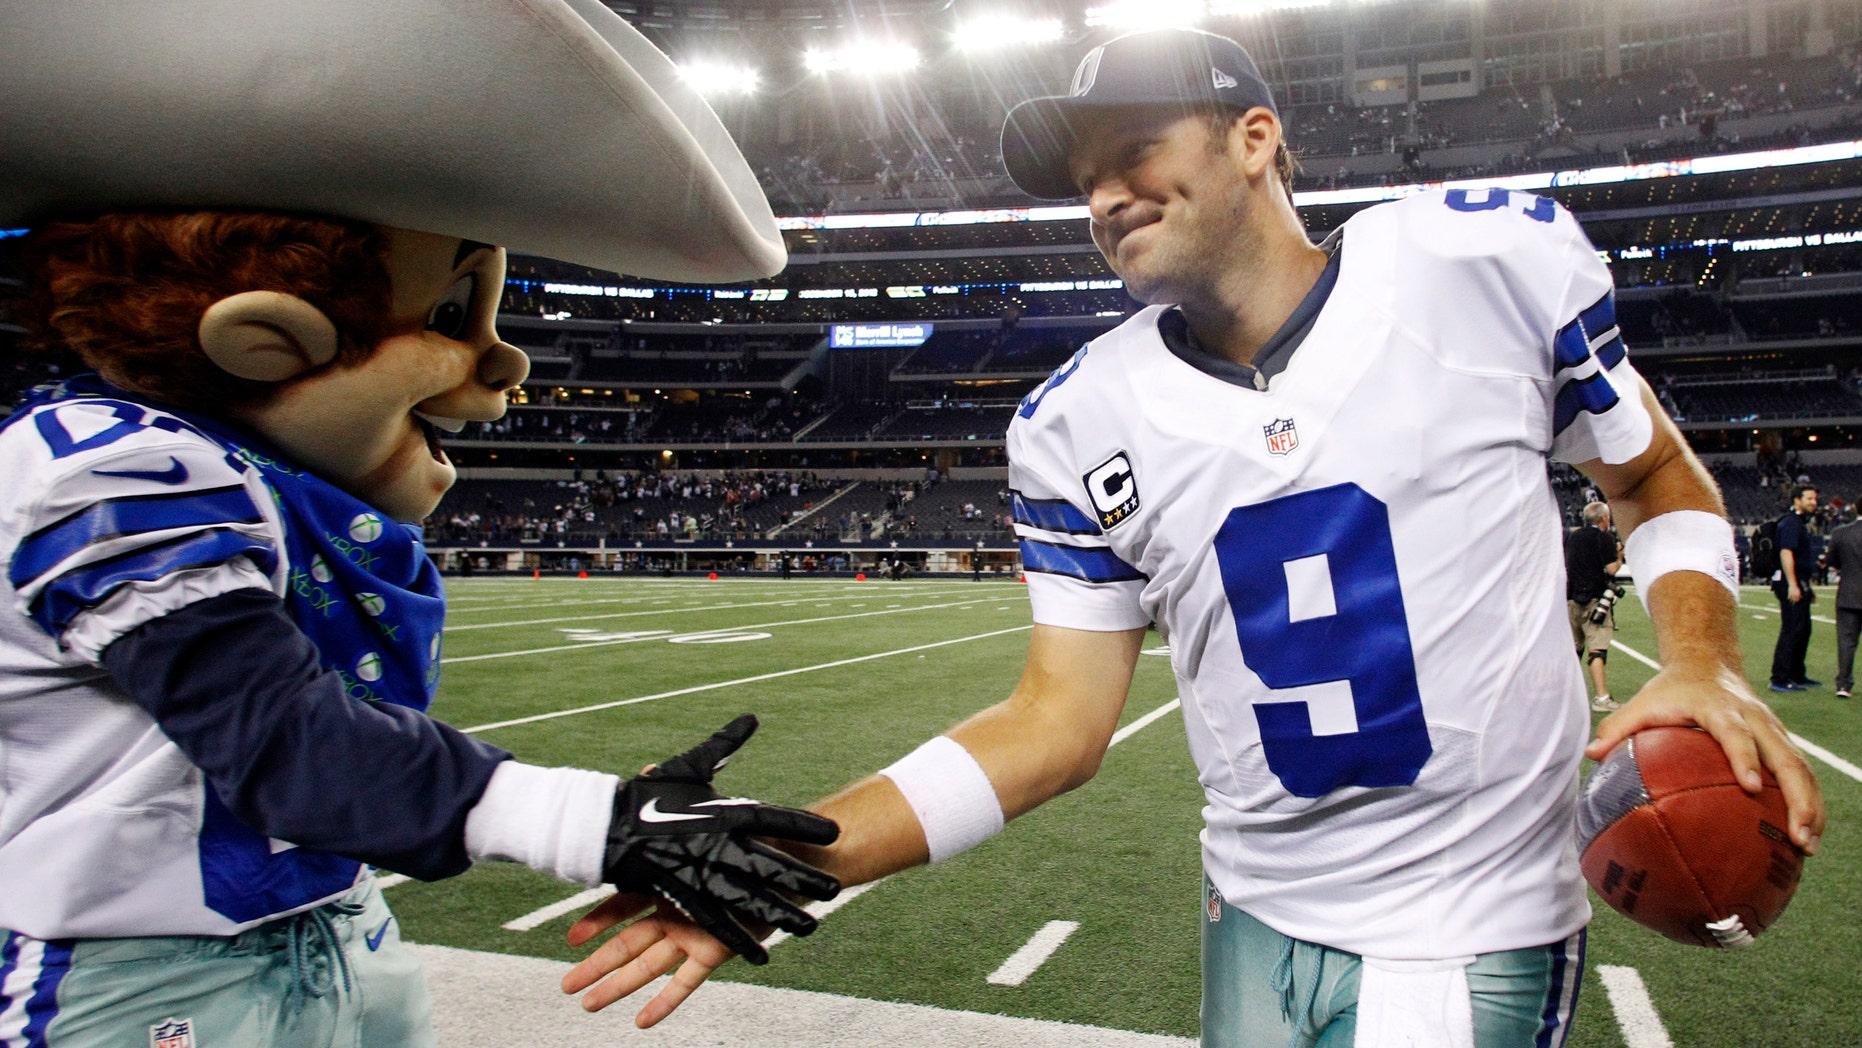 Dallas Cowboys quarterback Tony Romo (9) celebrates with team mascot Rowdy after defeating the Philadelphia Eagles 38-33 in an NFL football game Sunday, Dec. 2, 2012 in Arlington, Texas. (AP Photo/Tony Gutierrez)